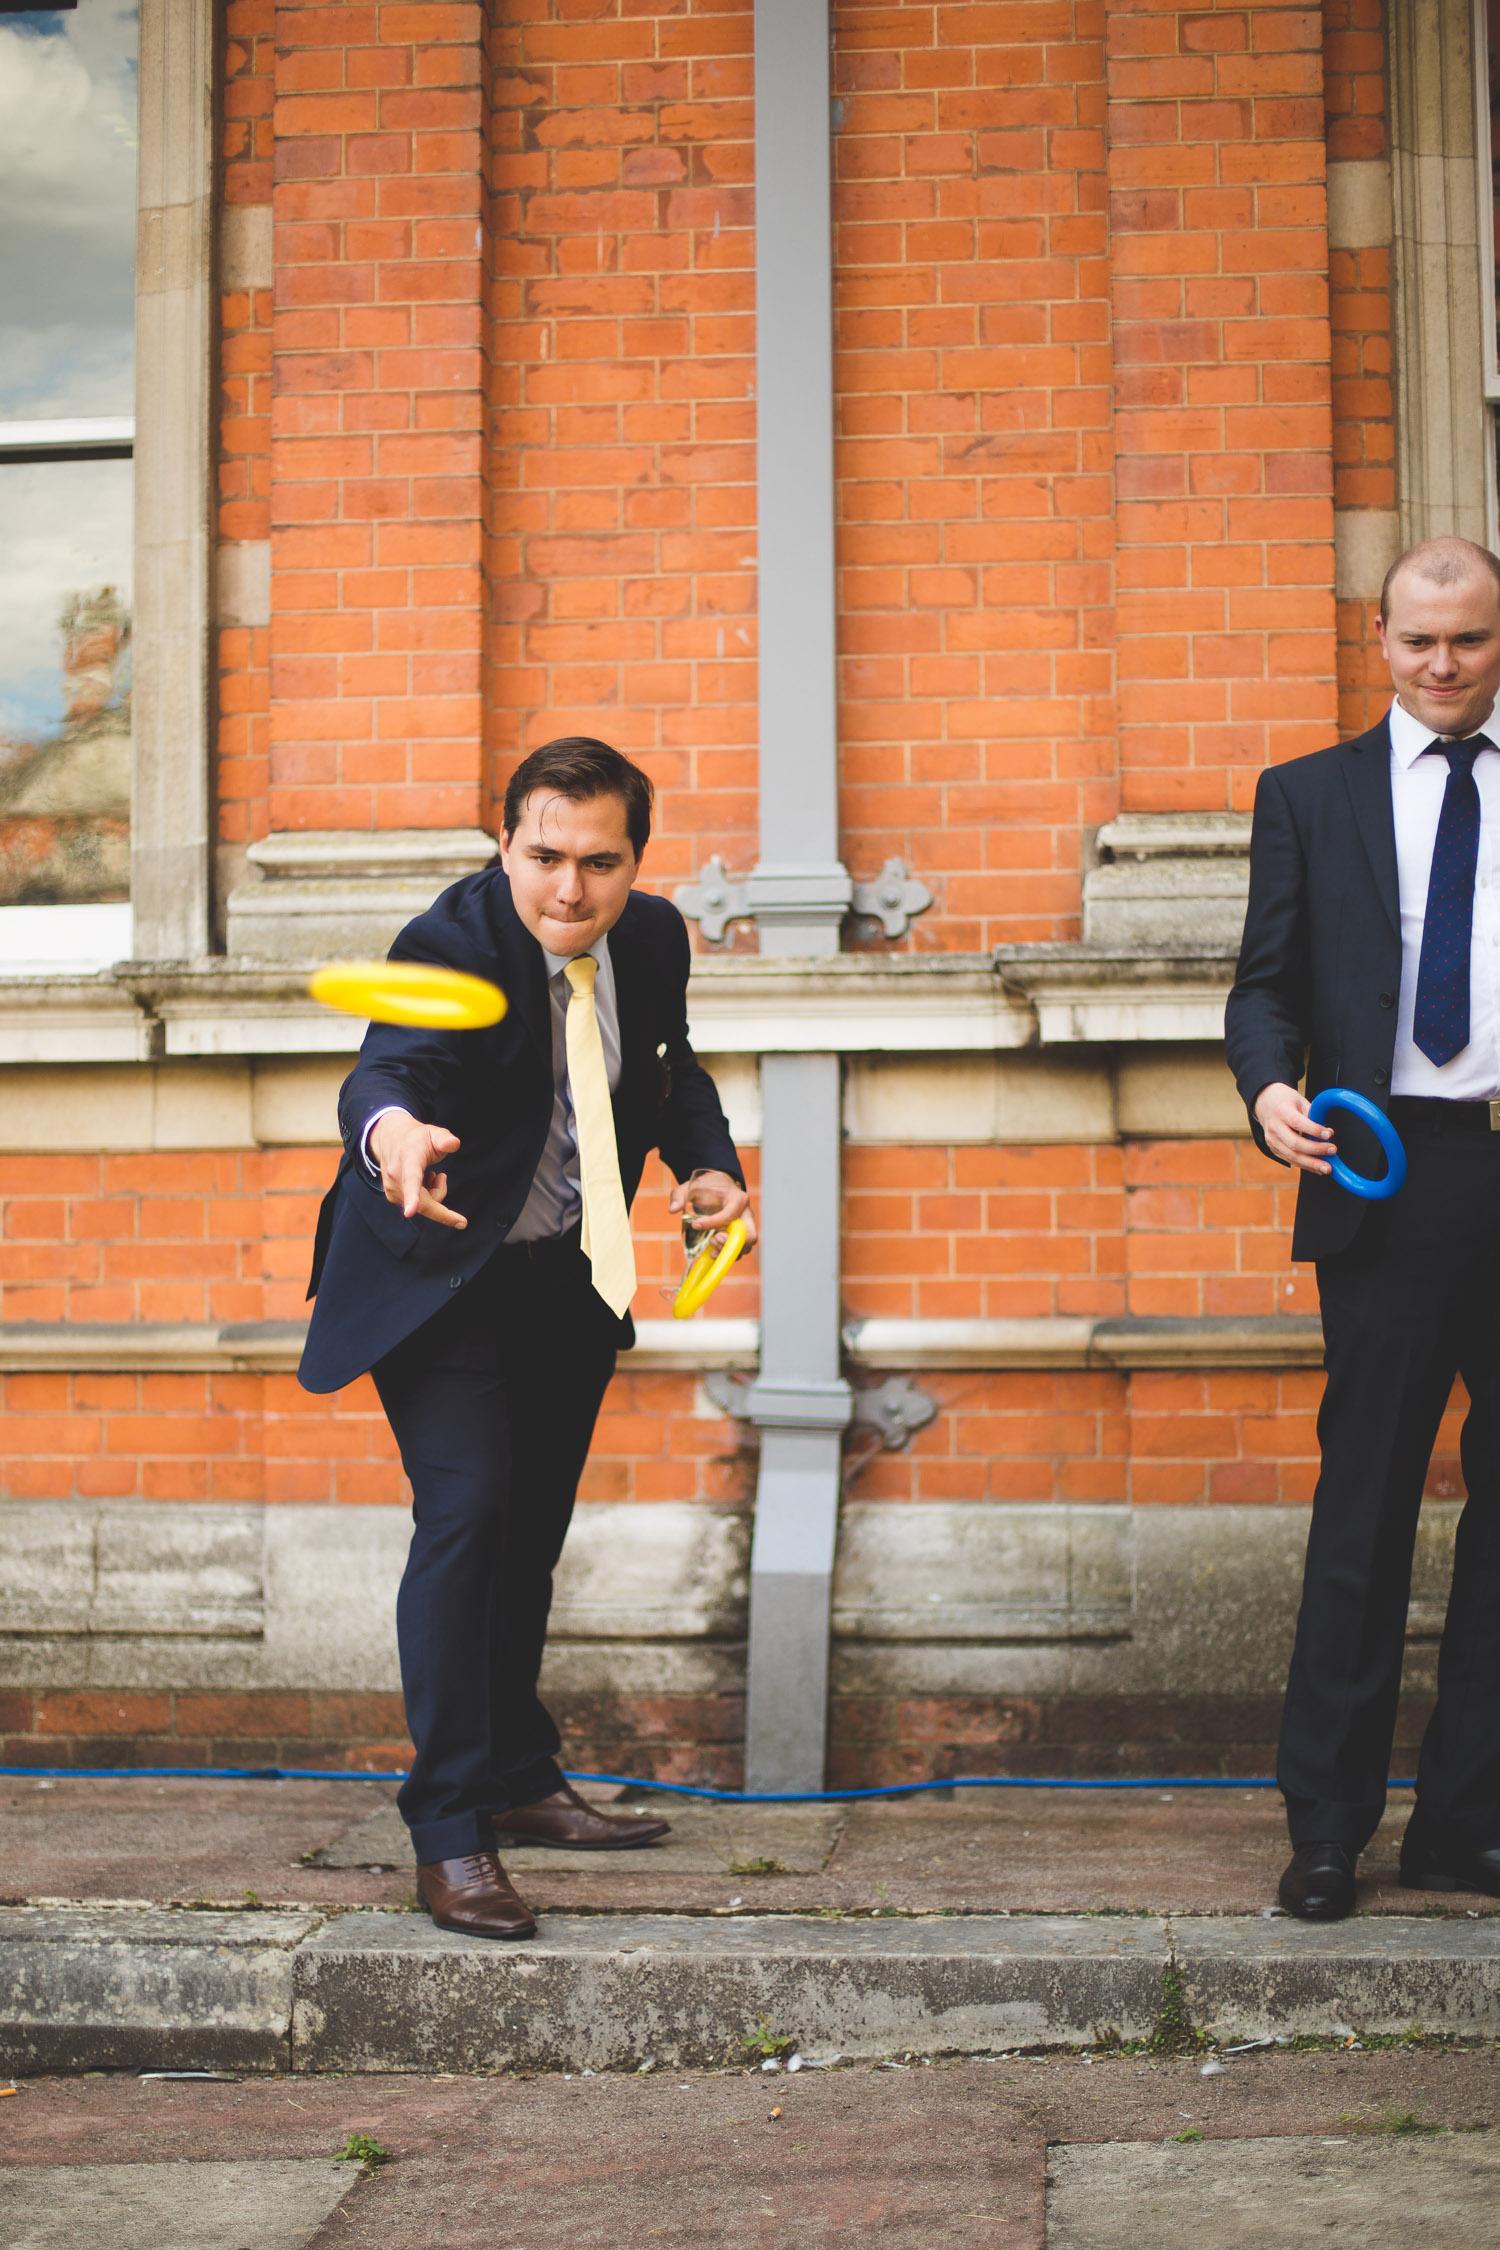 Surrey Wedding Photography Nicky Adam047.jpg